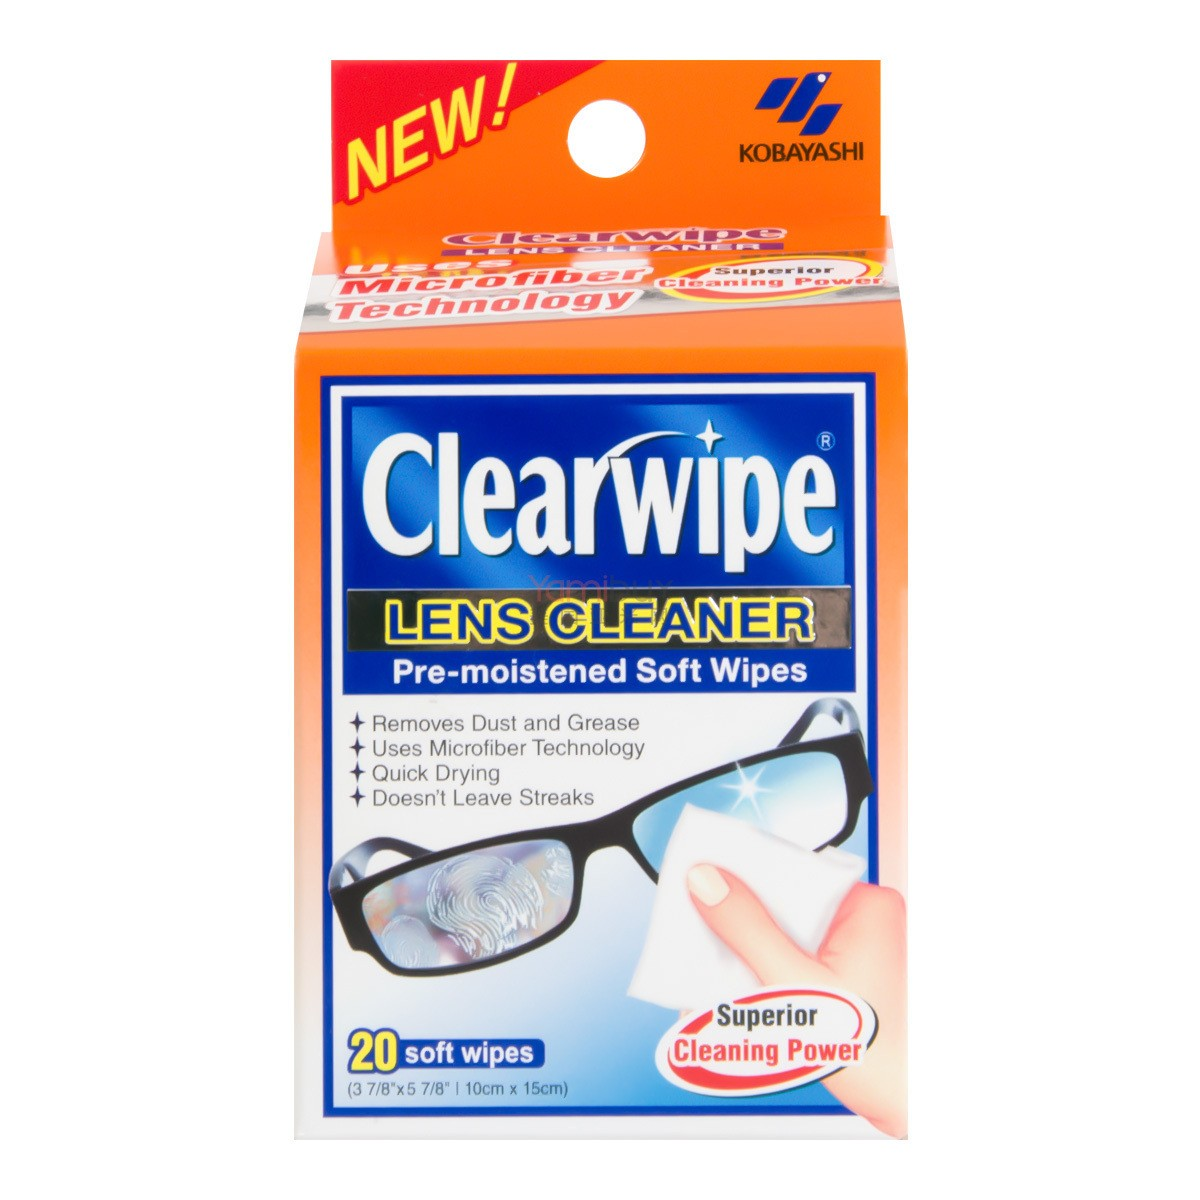 KOBAYASHI Lens Cleaning Tissue 20 packs